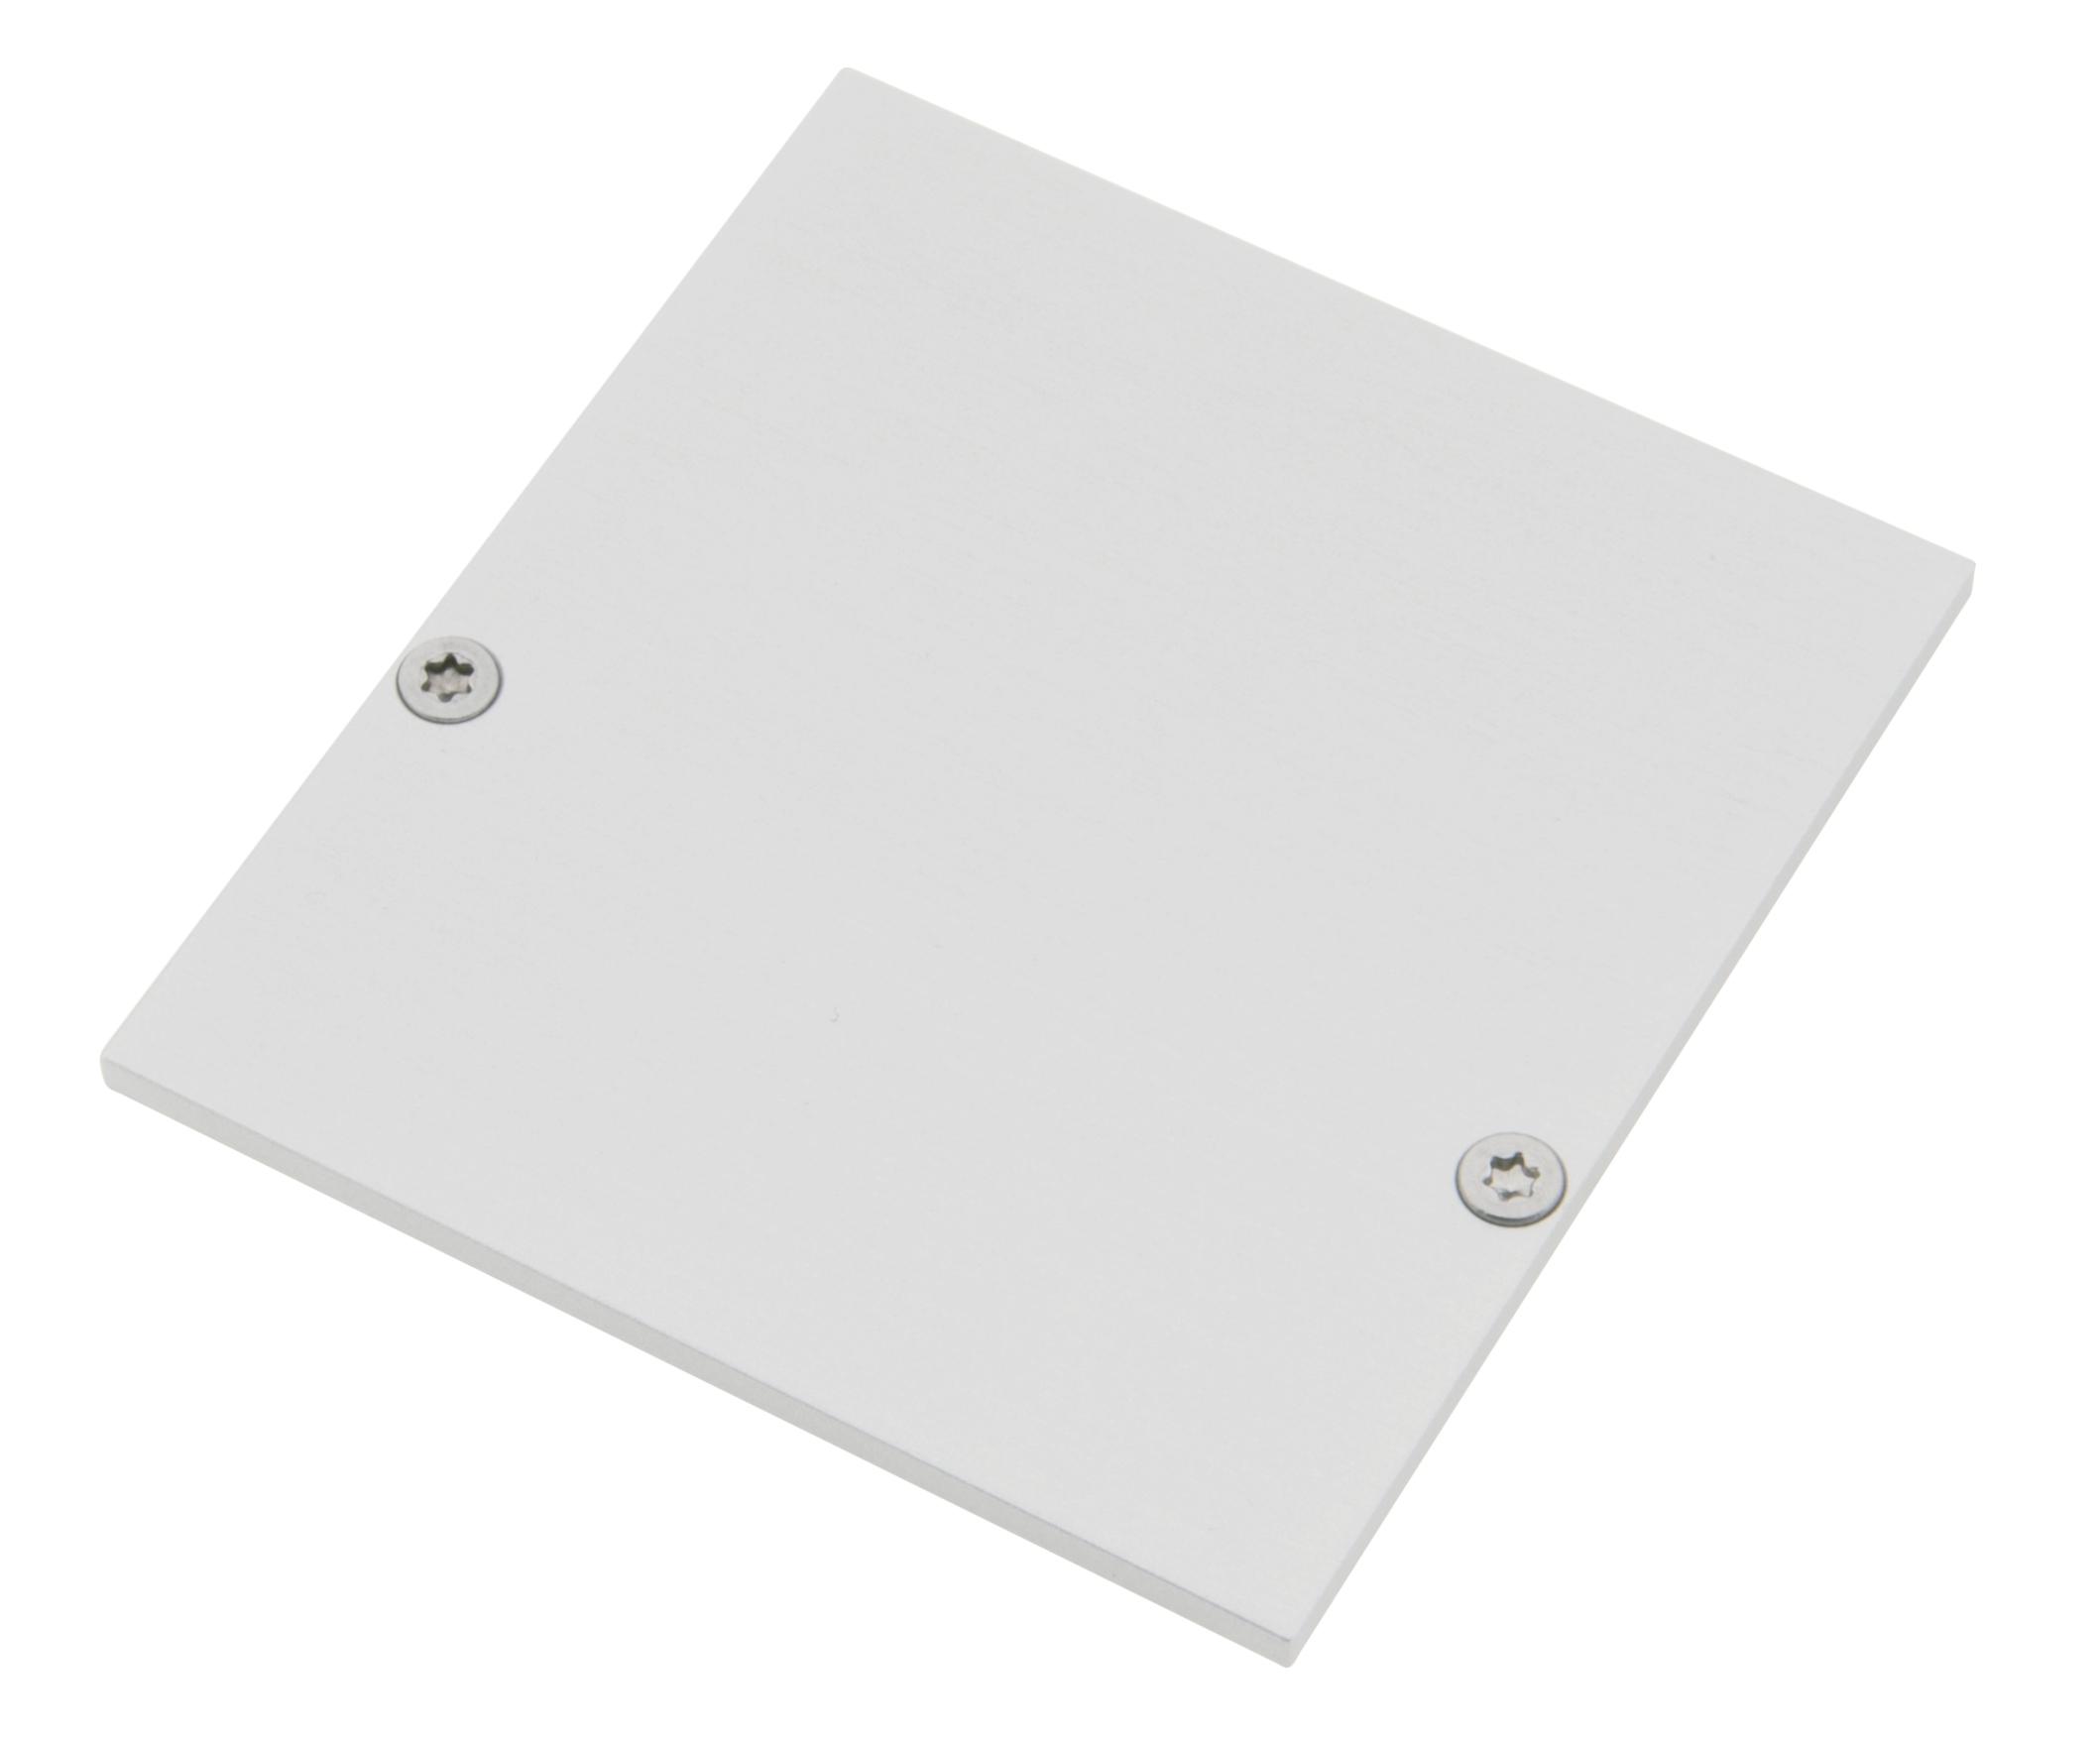 1 Stk Profil Endkappe SLR Eckig geschlossen inkl. Schrauben LIEK003120